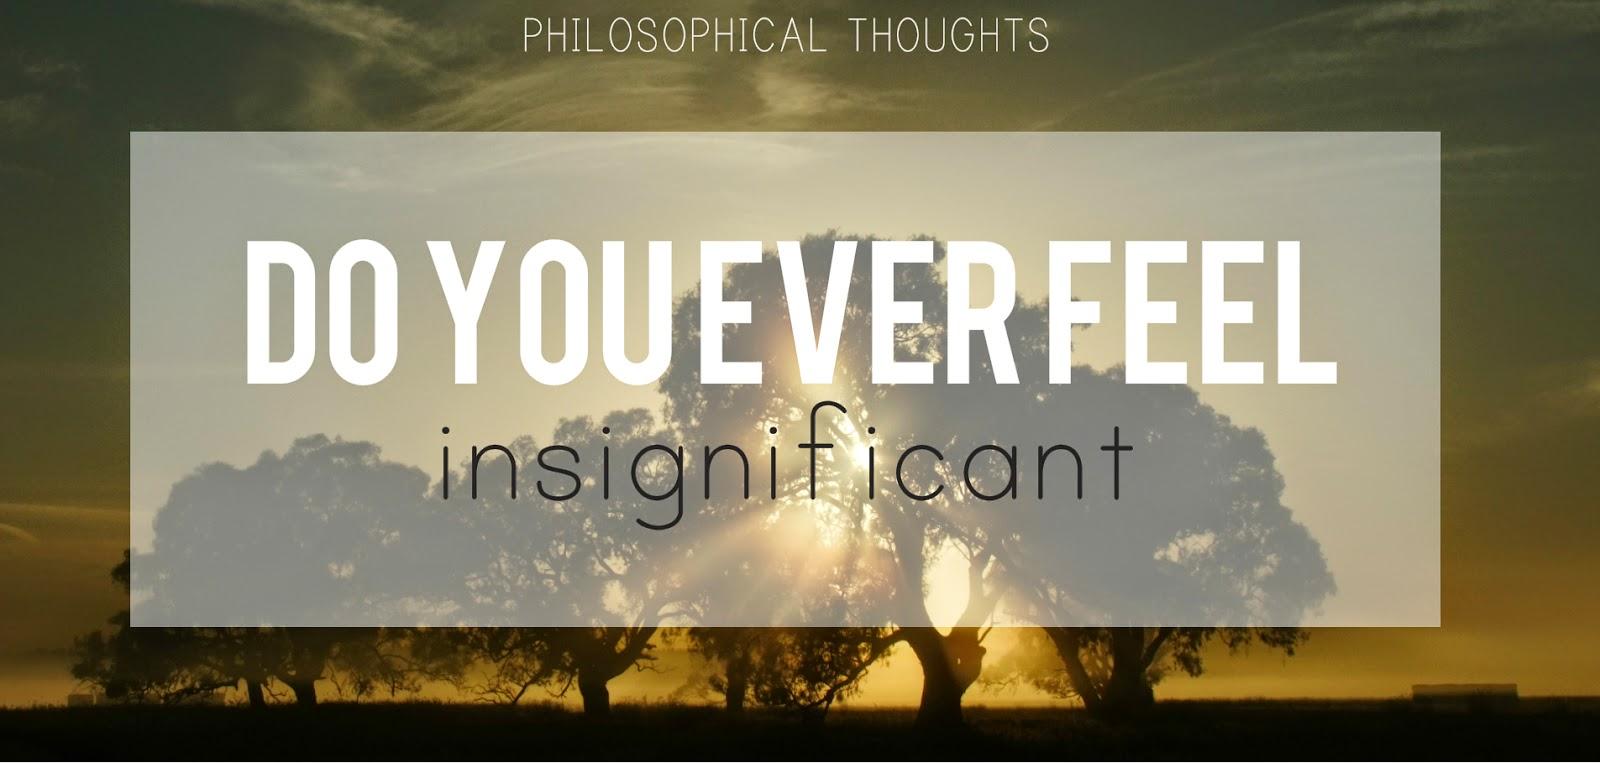 http://kerryshabitat.blogspot.co.uk/2013/10/do-you-ever-feel-insignificant.html